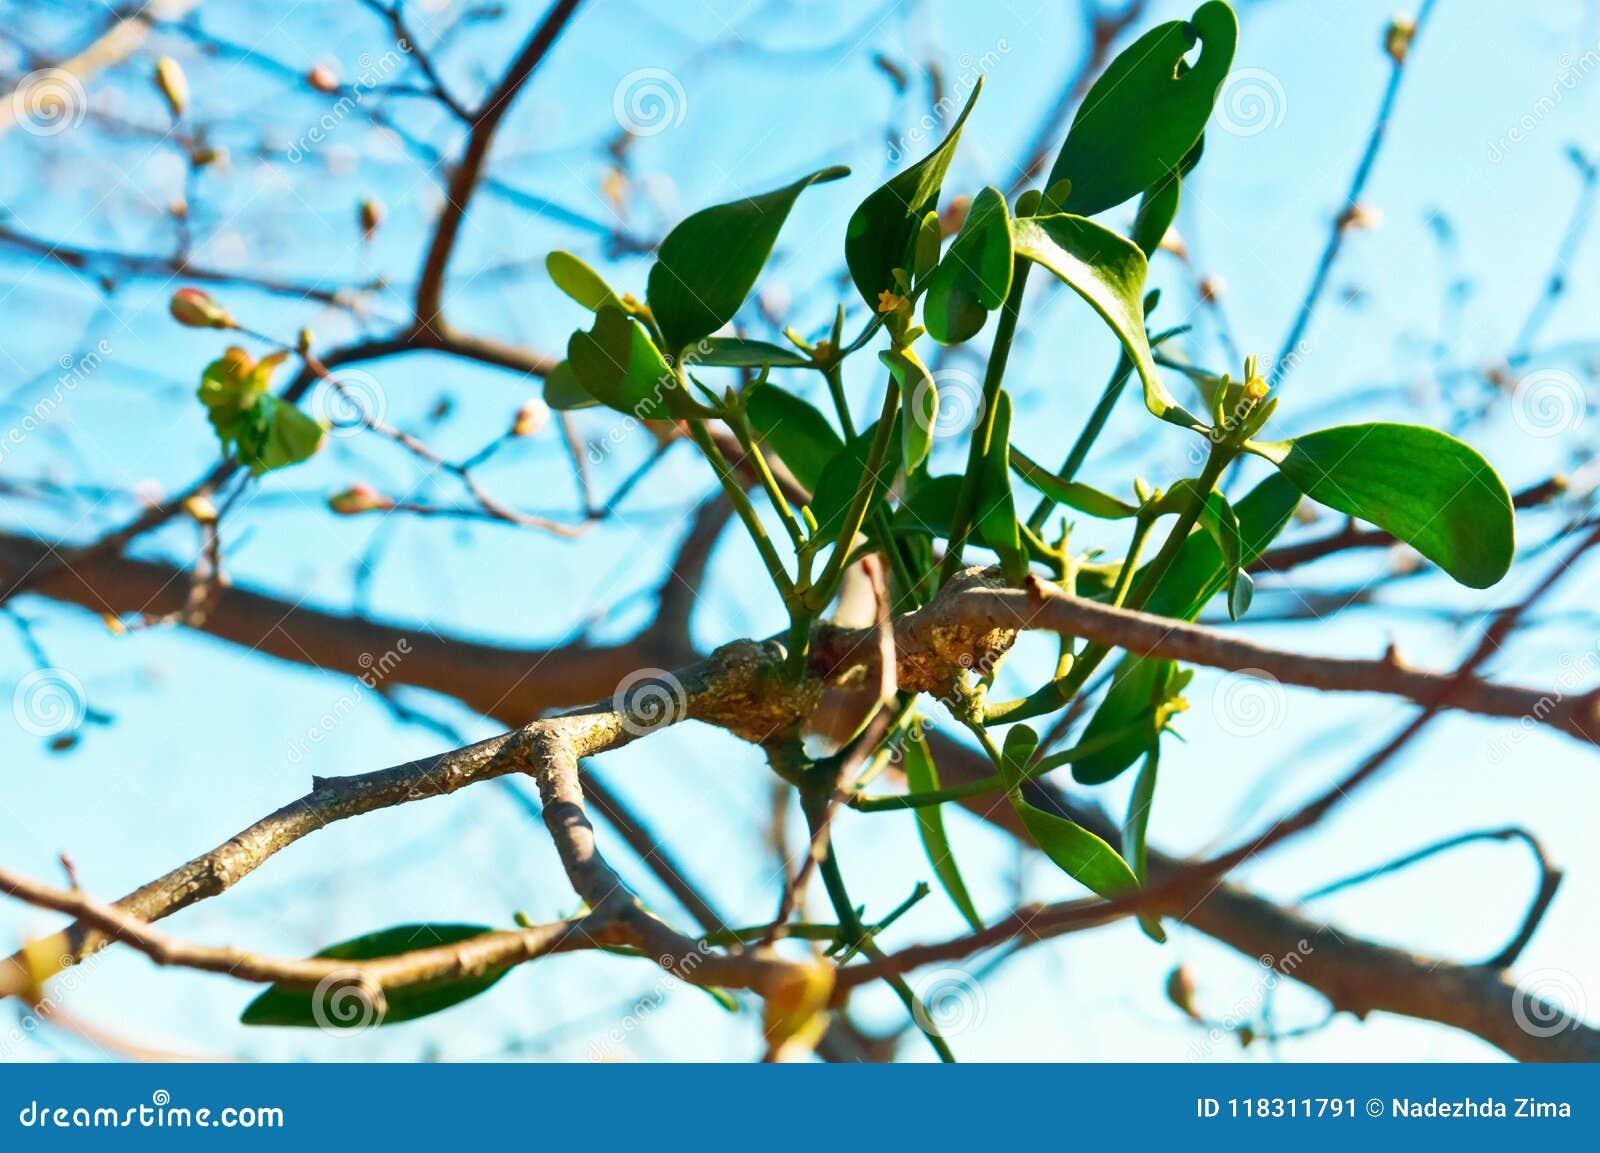 Bush Is Mistletoe A Plant Parasite Mistletoe On A Tree The